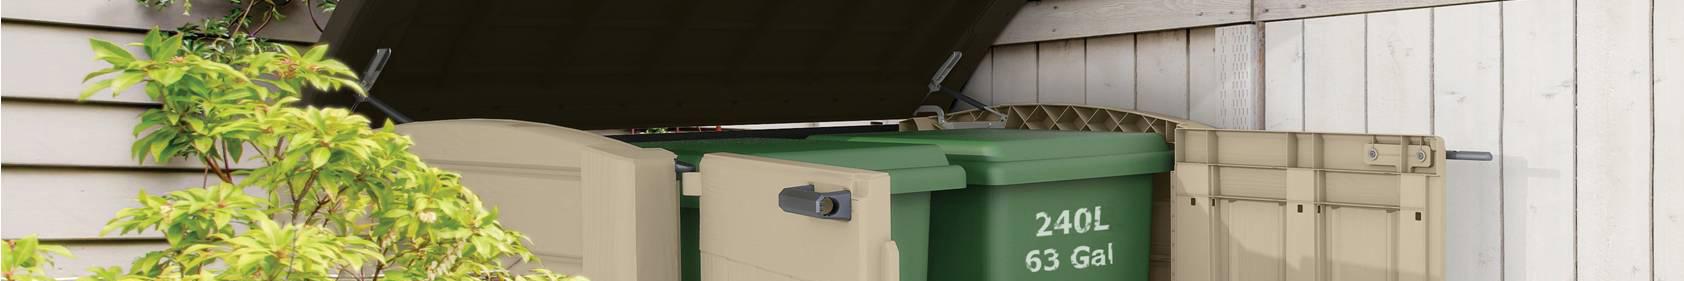 Portabidoni contenitori rifiuti